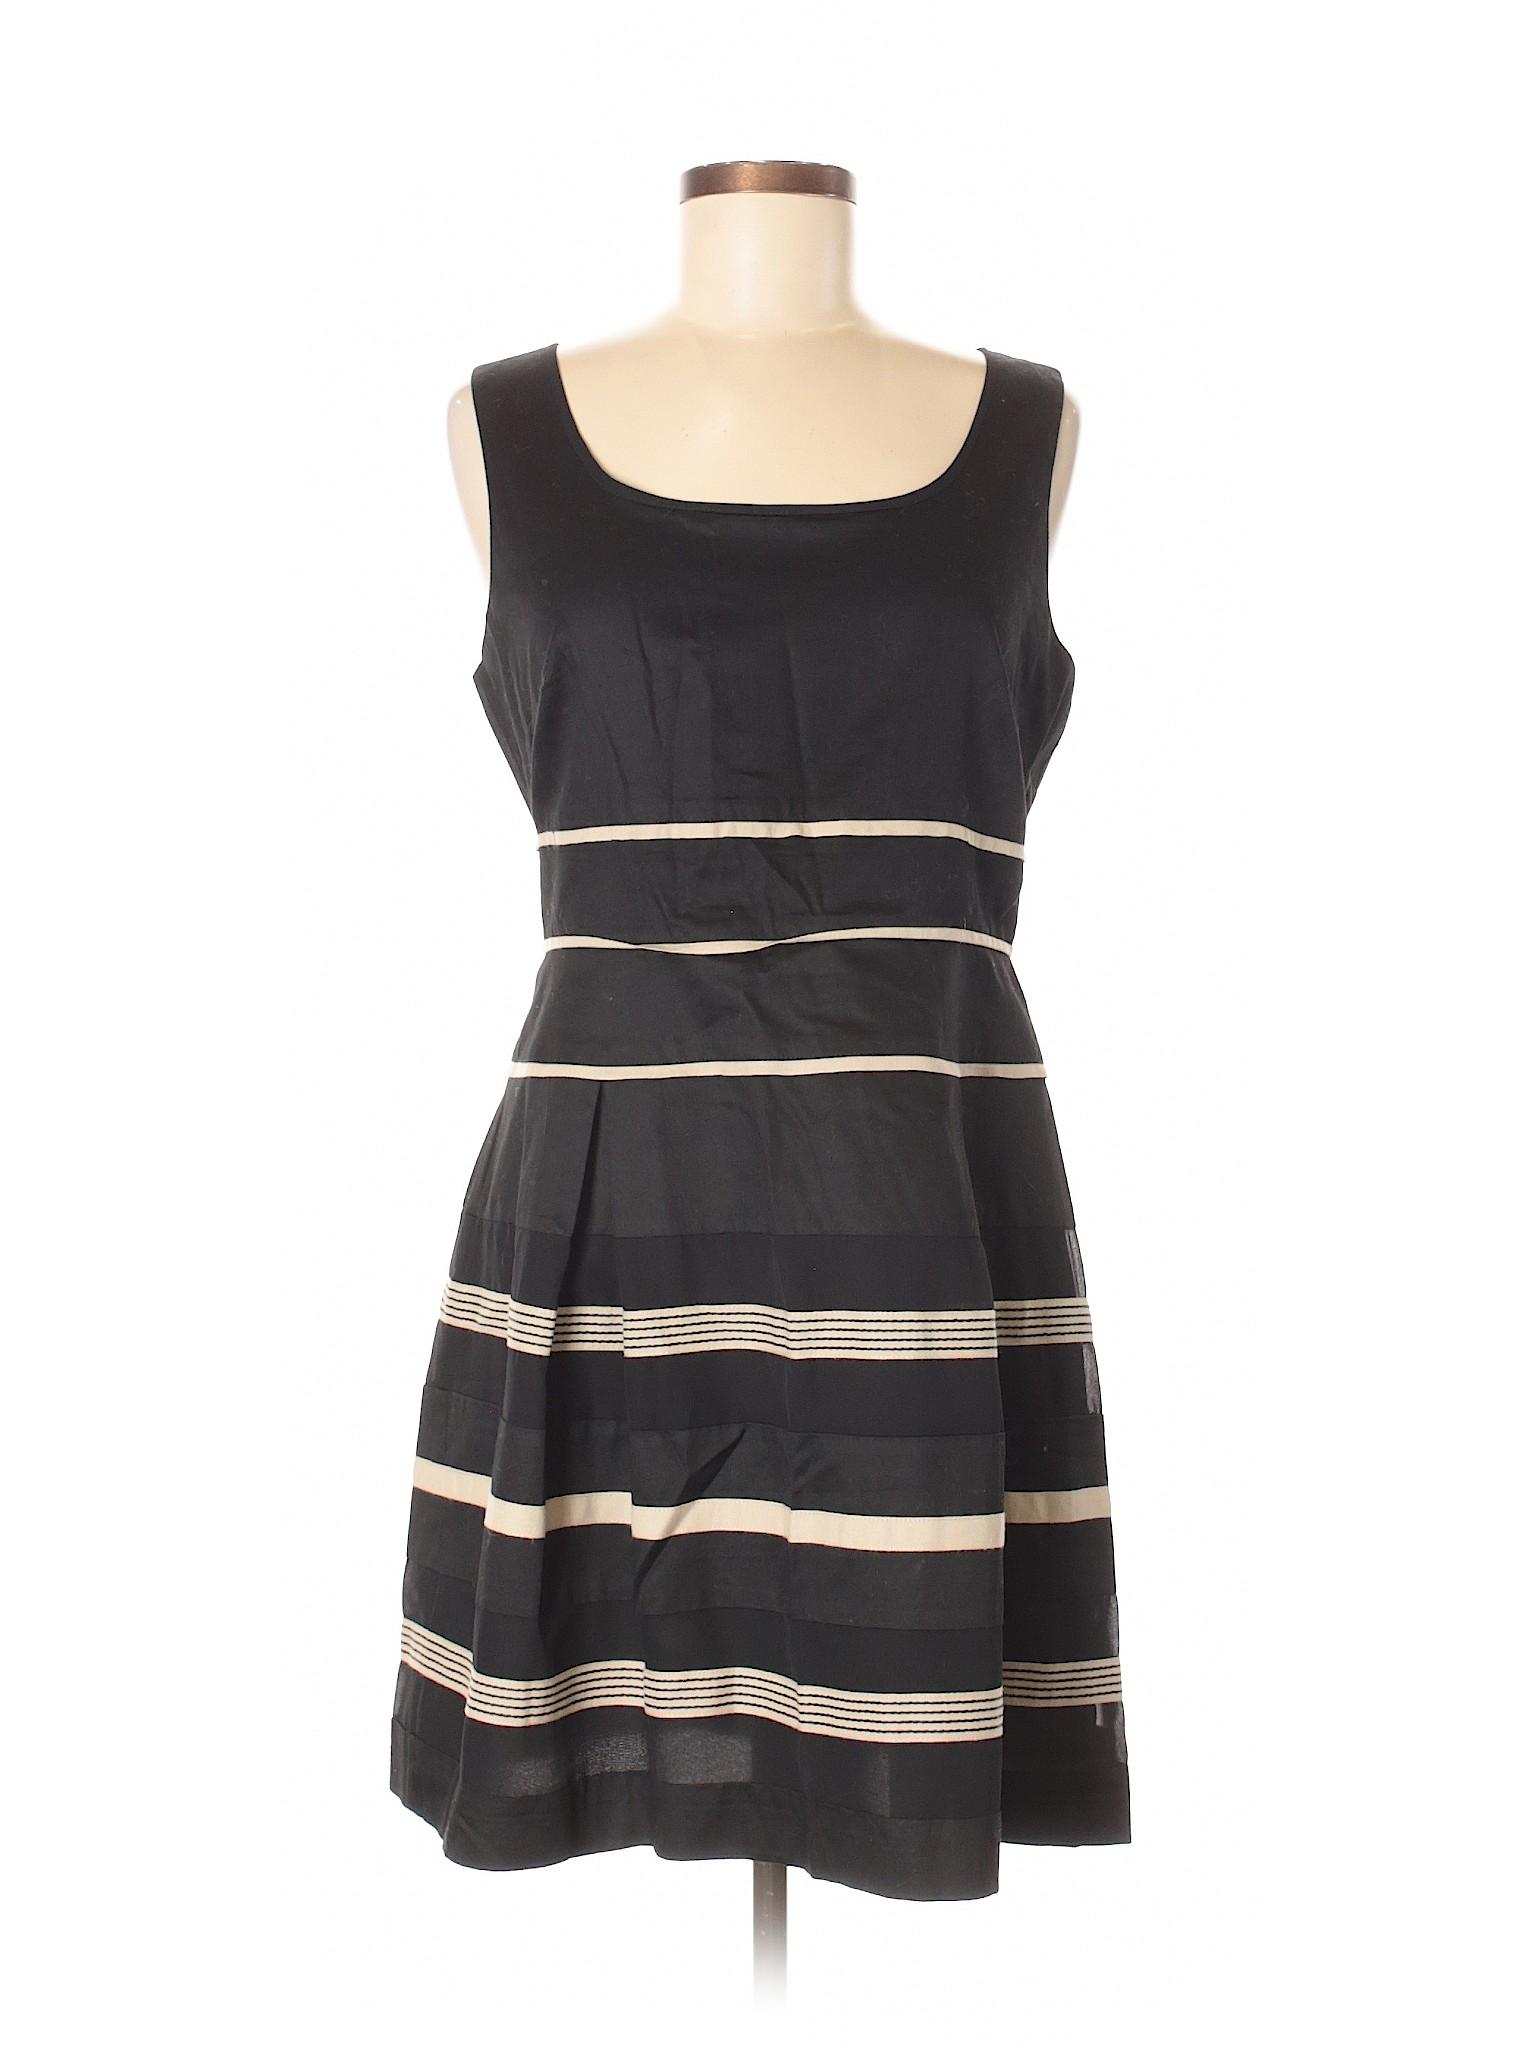 winter Casual Taylor Dress Boutique Ann 7dWqwvvA